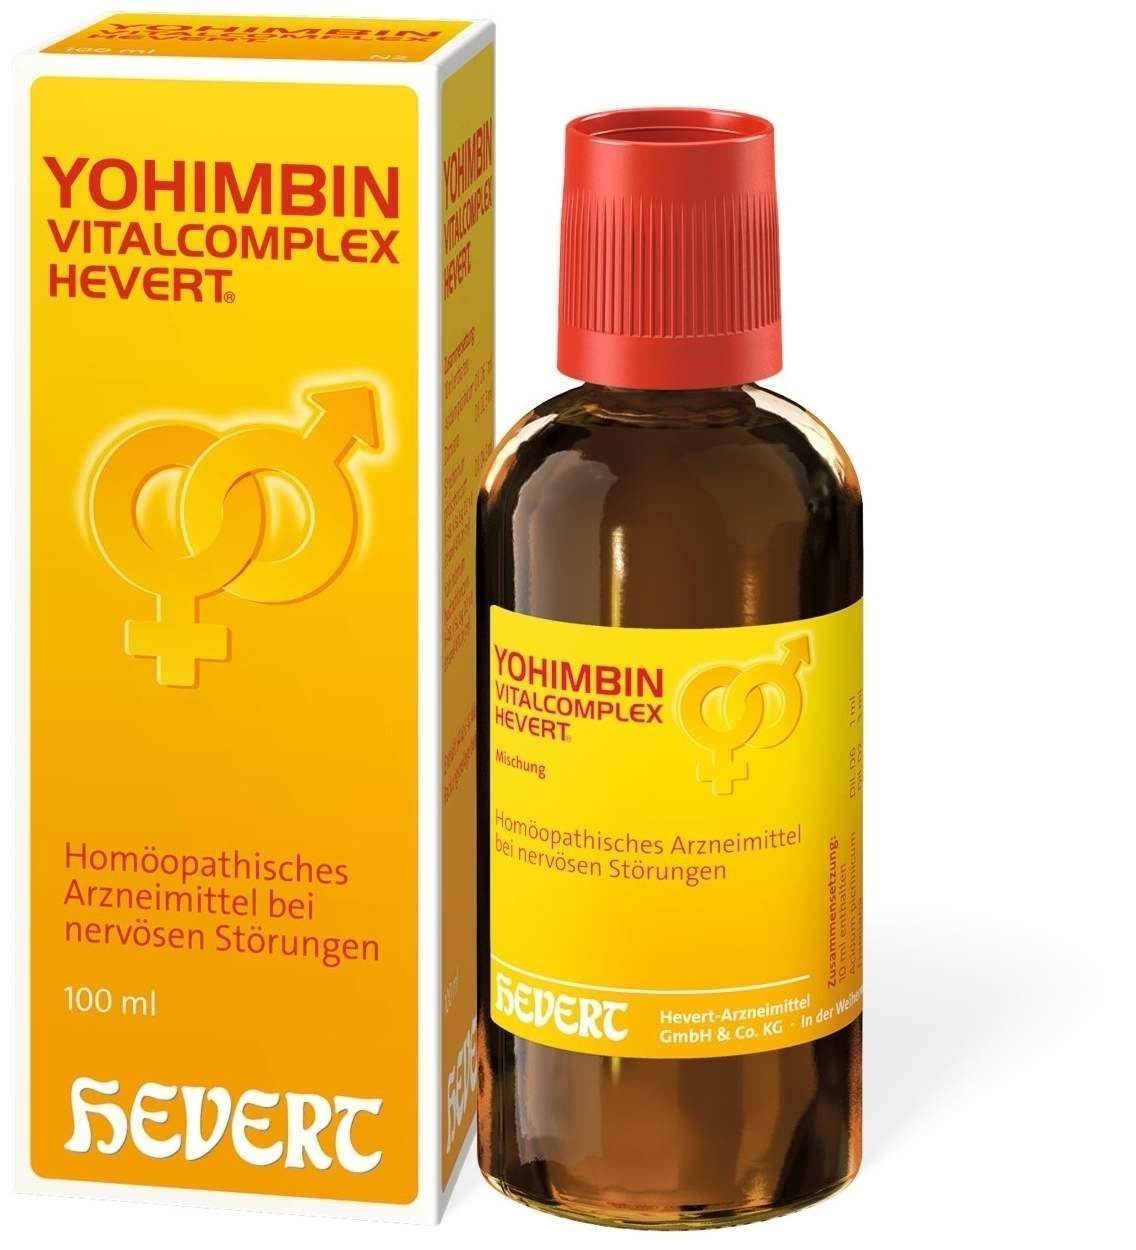 Yohimbin Vitalcomplex 100 ml Tropfen